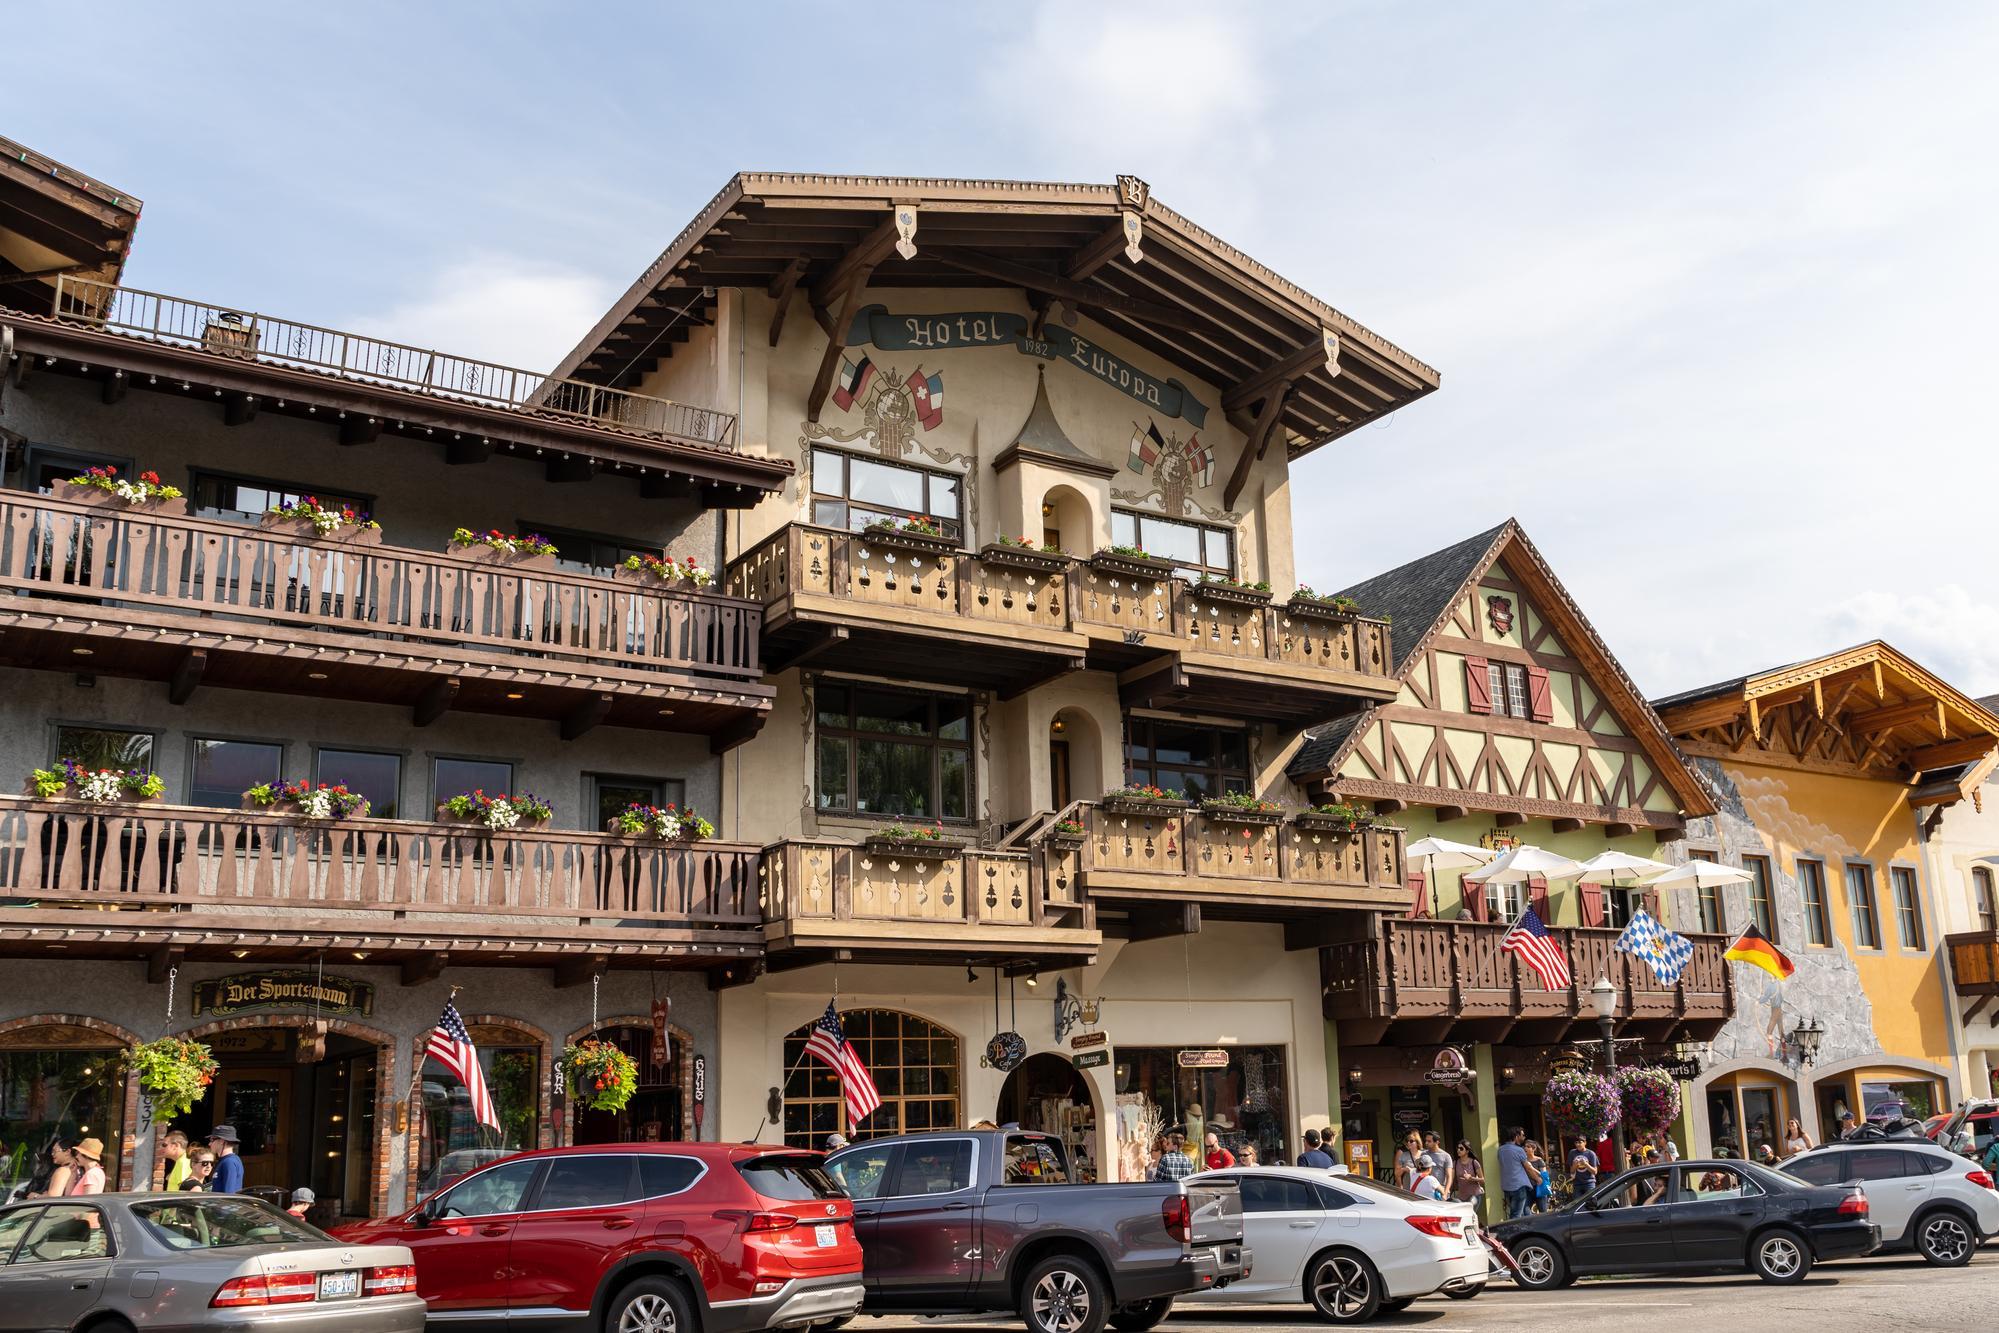 Bavarian style hotel